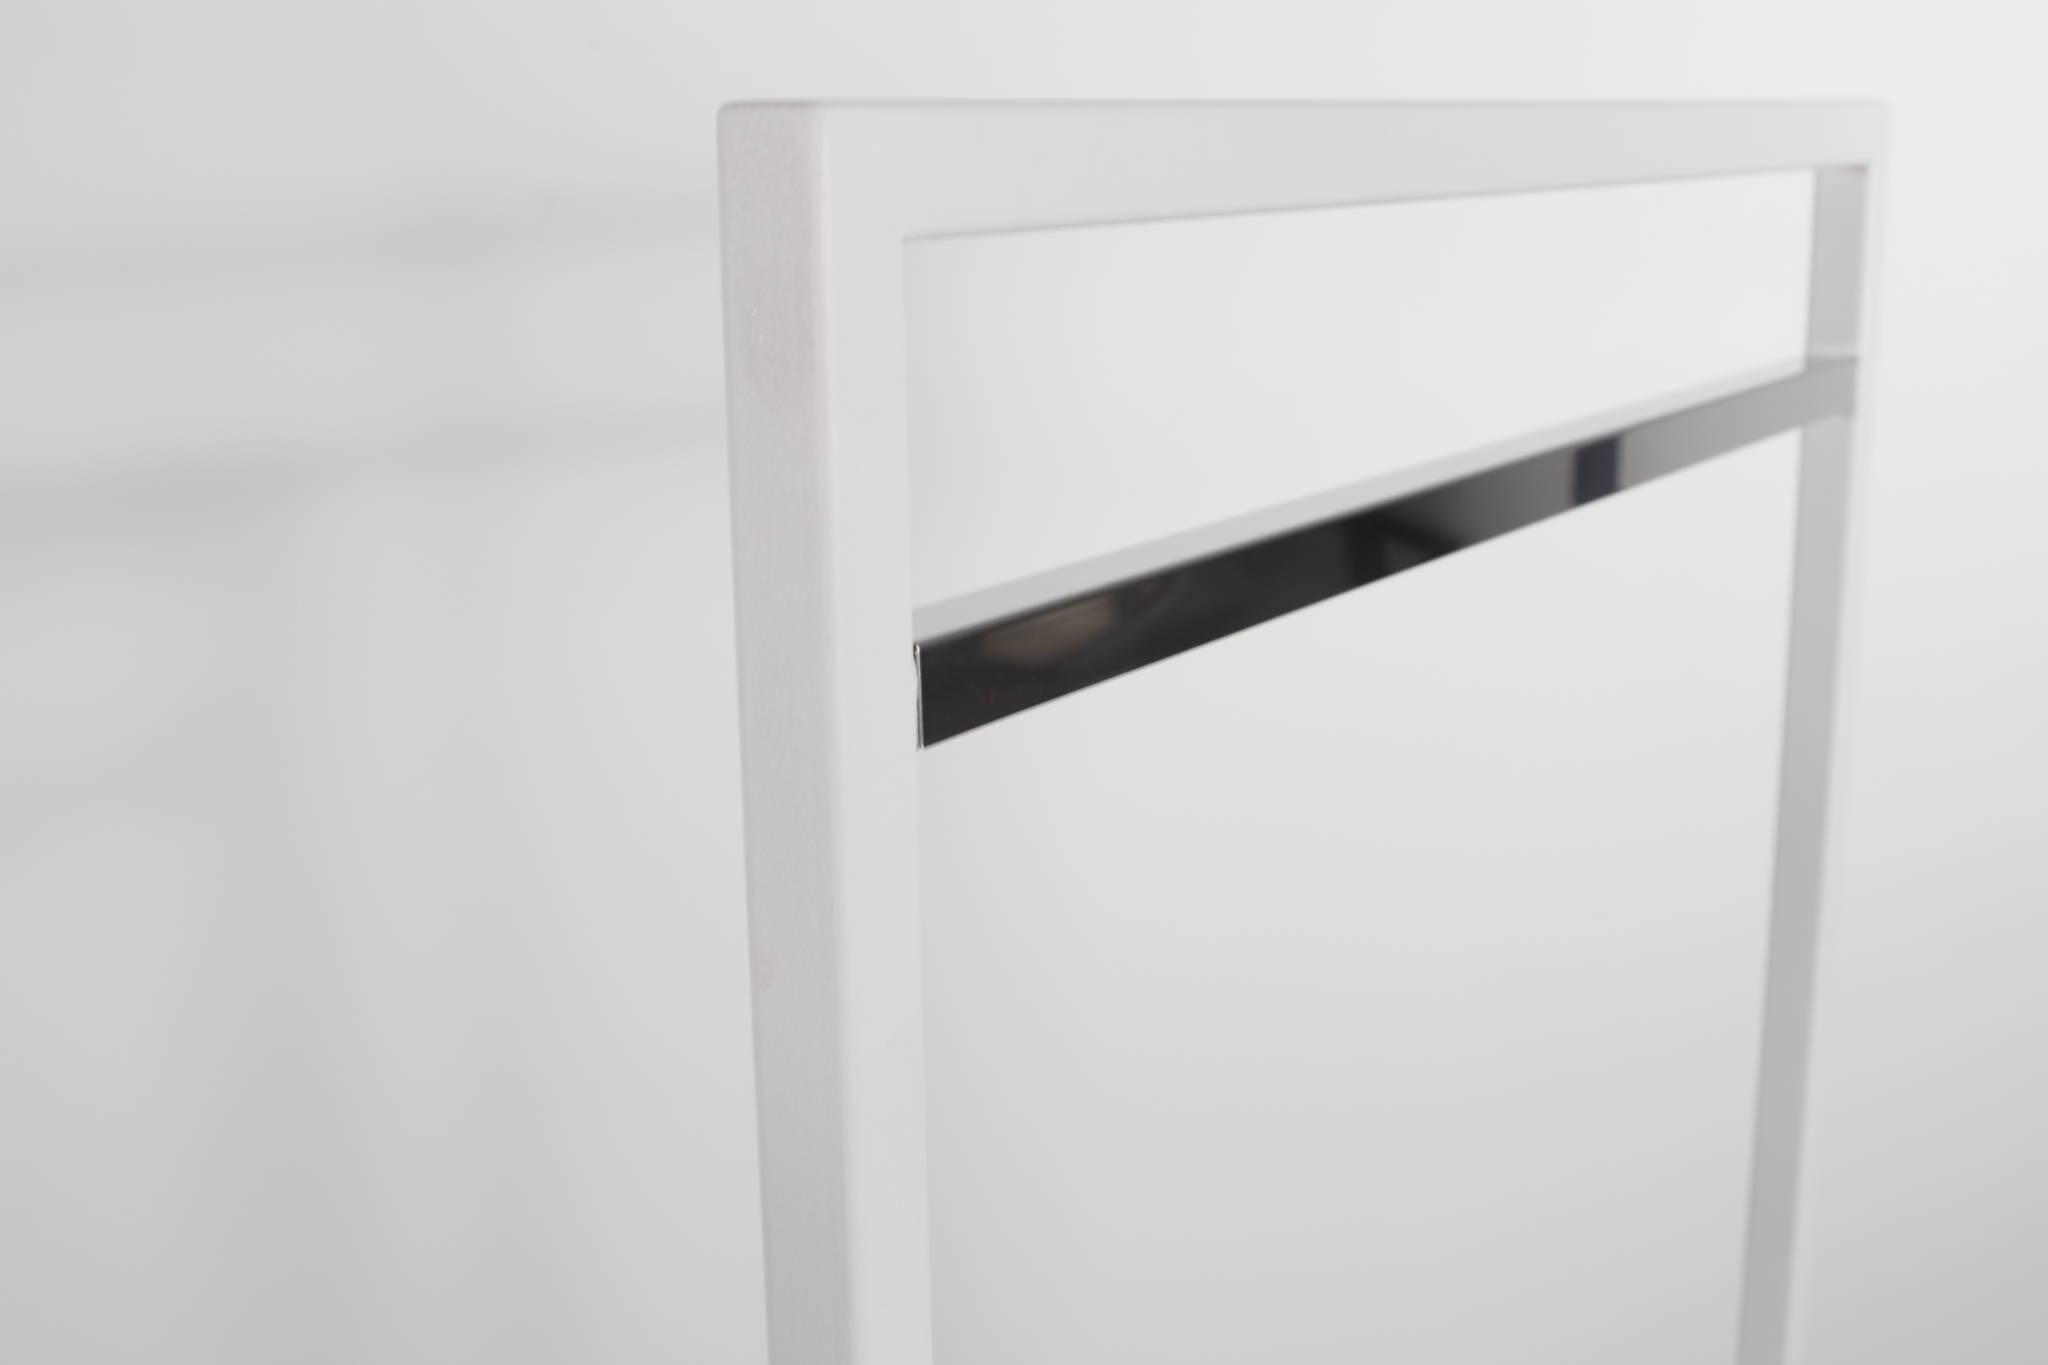 Design tøjstativ i hvid med sølv - detalje